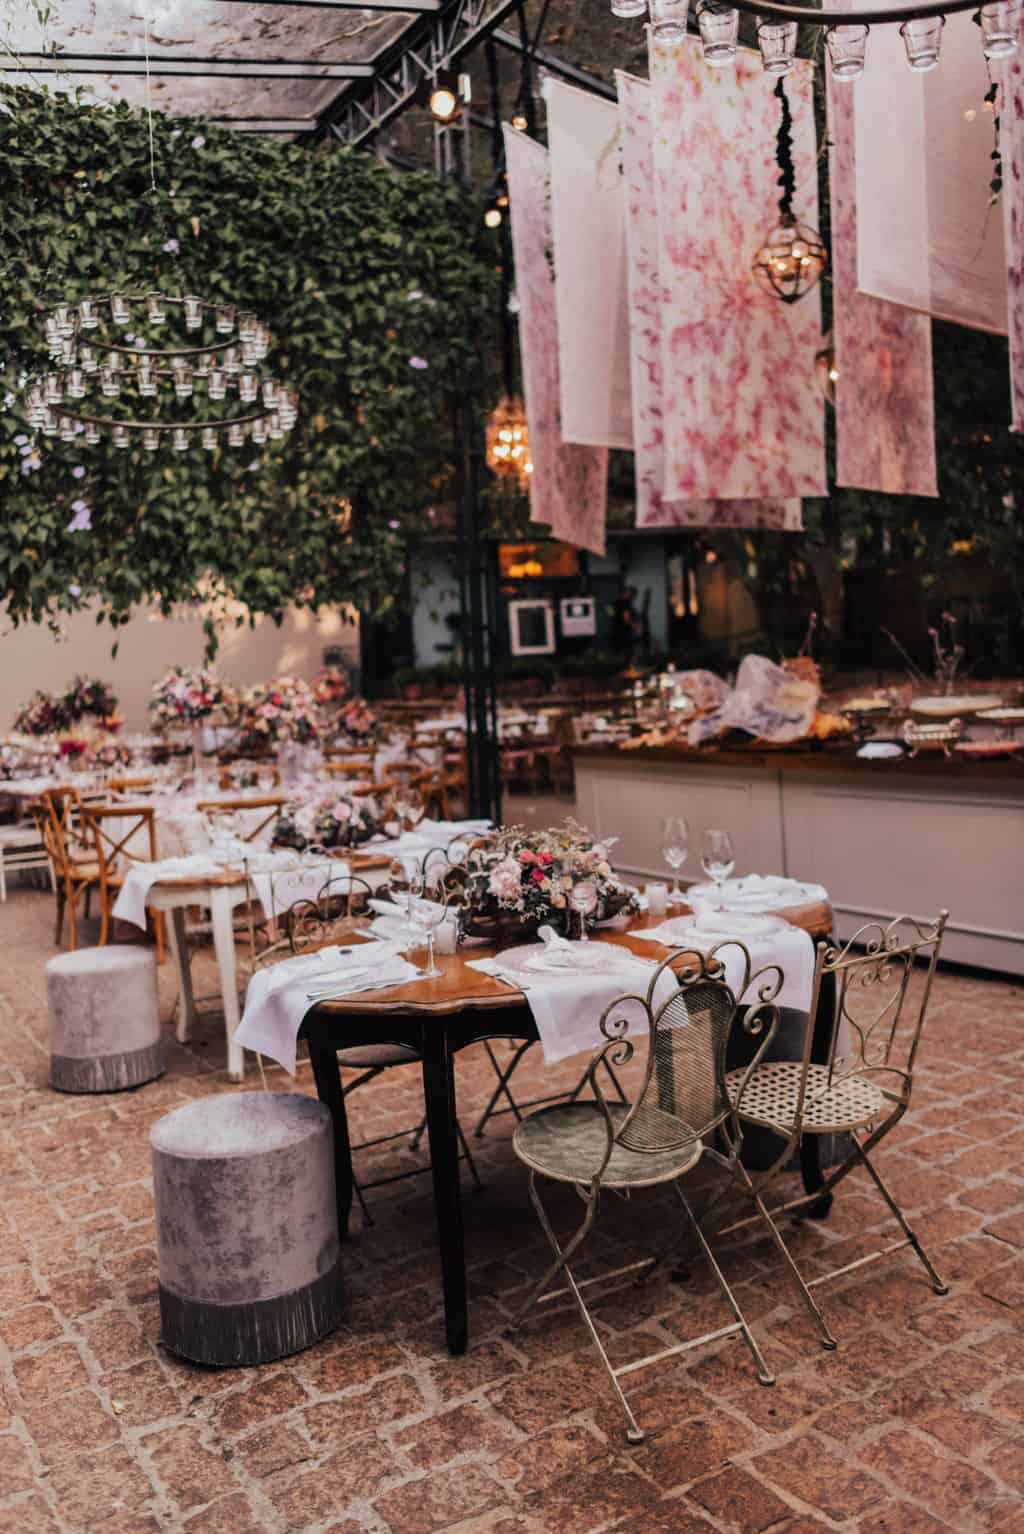 Boutique-de-Cena-casamento-Rebeca-e-Eldrey-Fazenda-Vila-Rica-Fotografia-Mana-Gollo-mesa-dos-convidados-Toda-de-Branco42